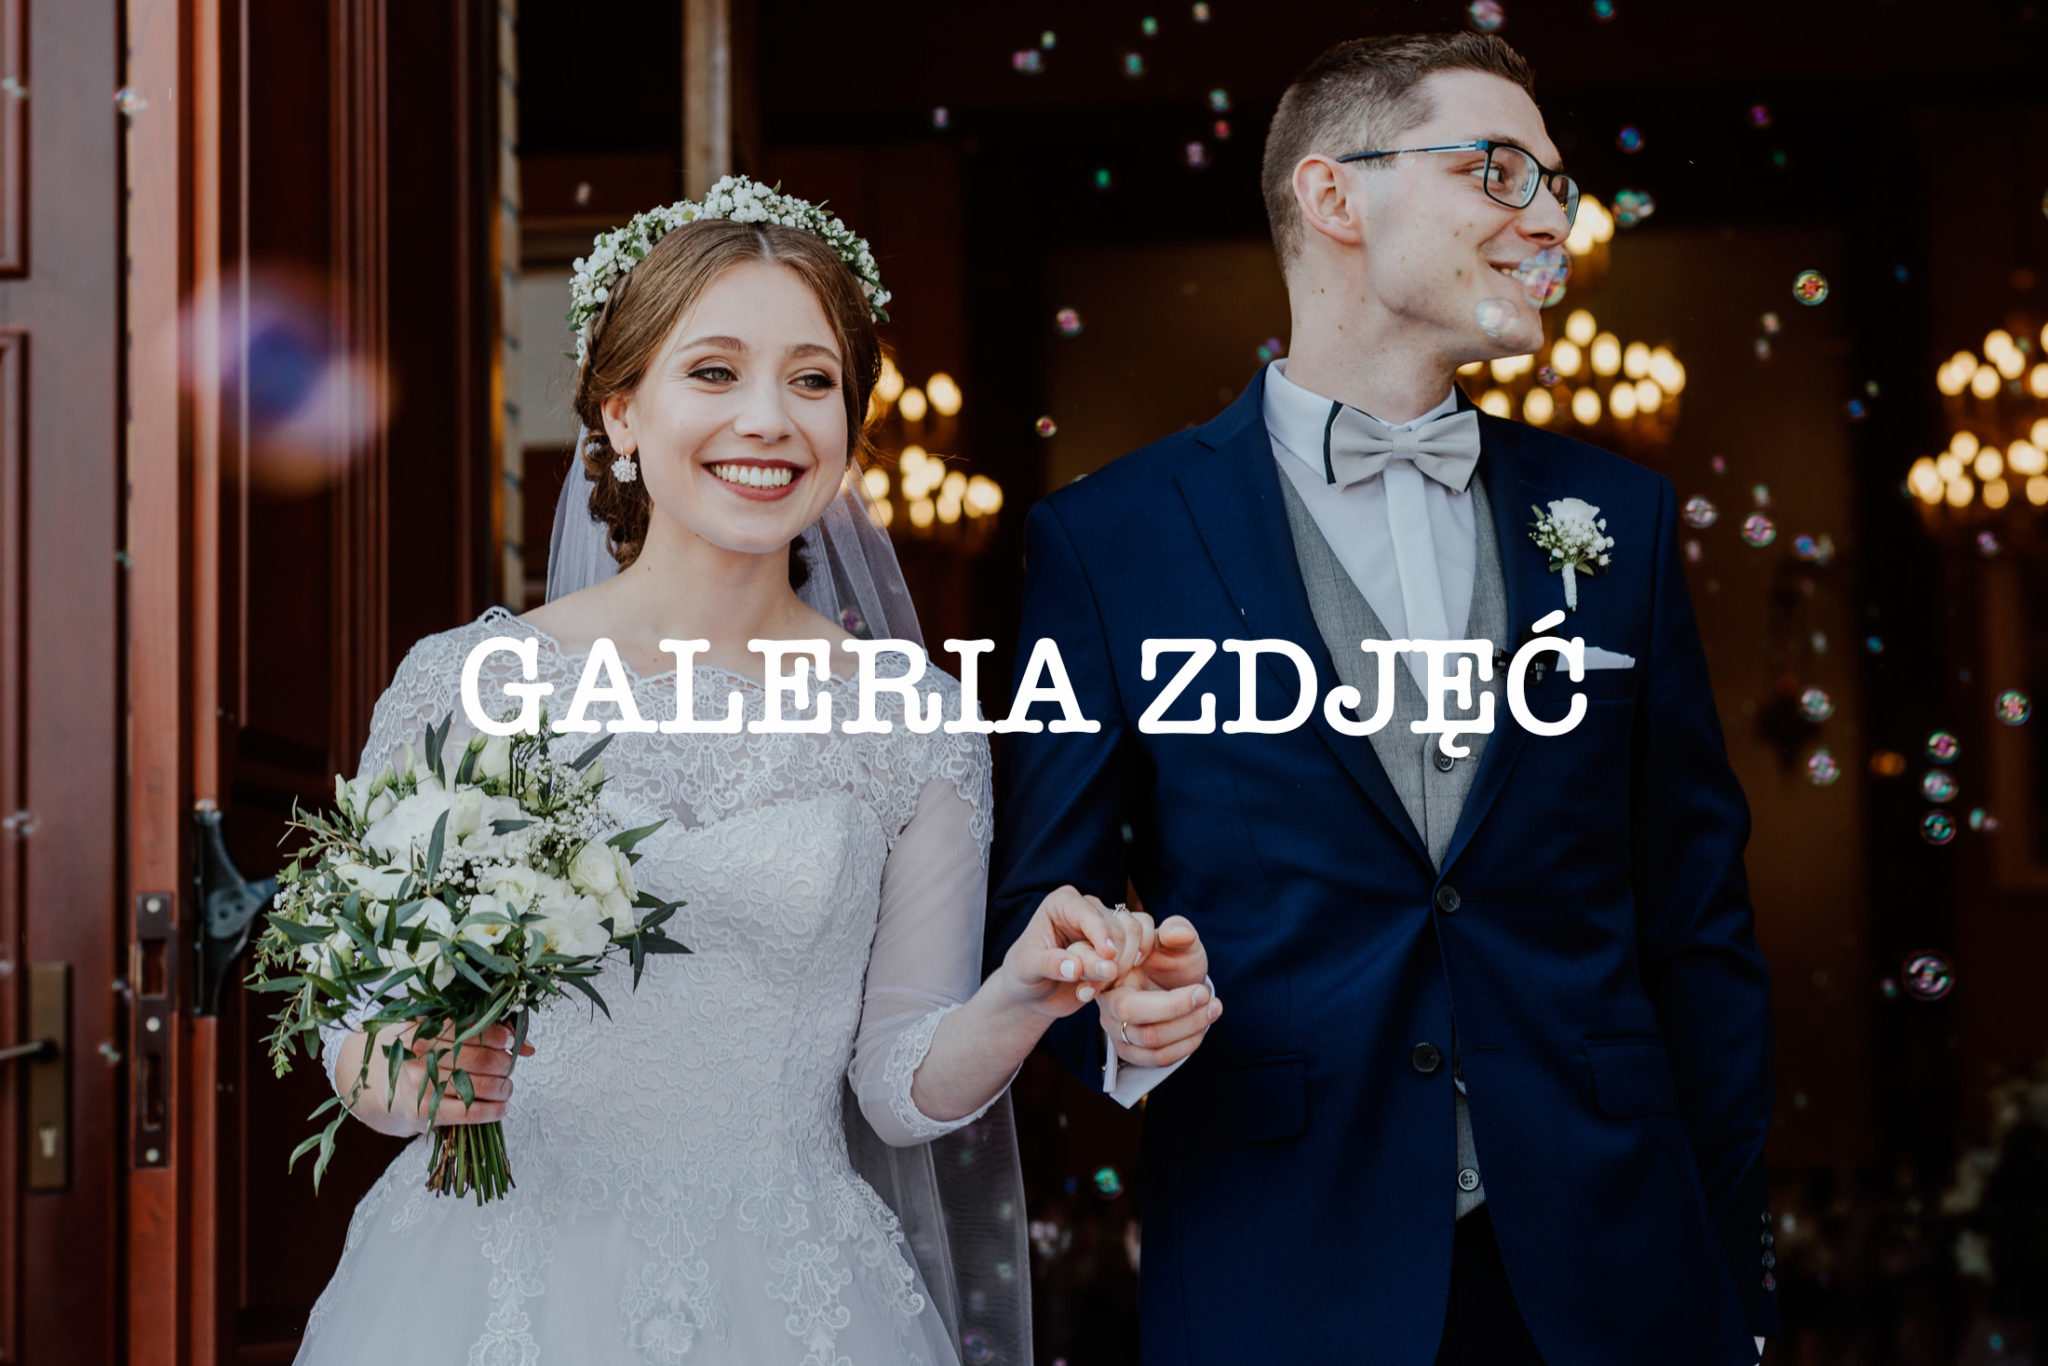 Ślub-Oli-i-Dominika216-copy Ślub Oli i Dominika